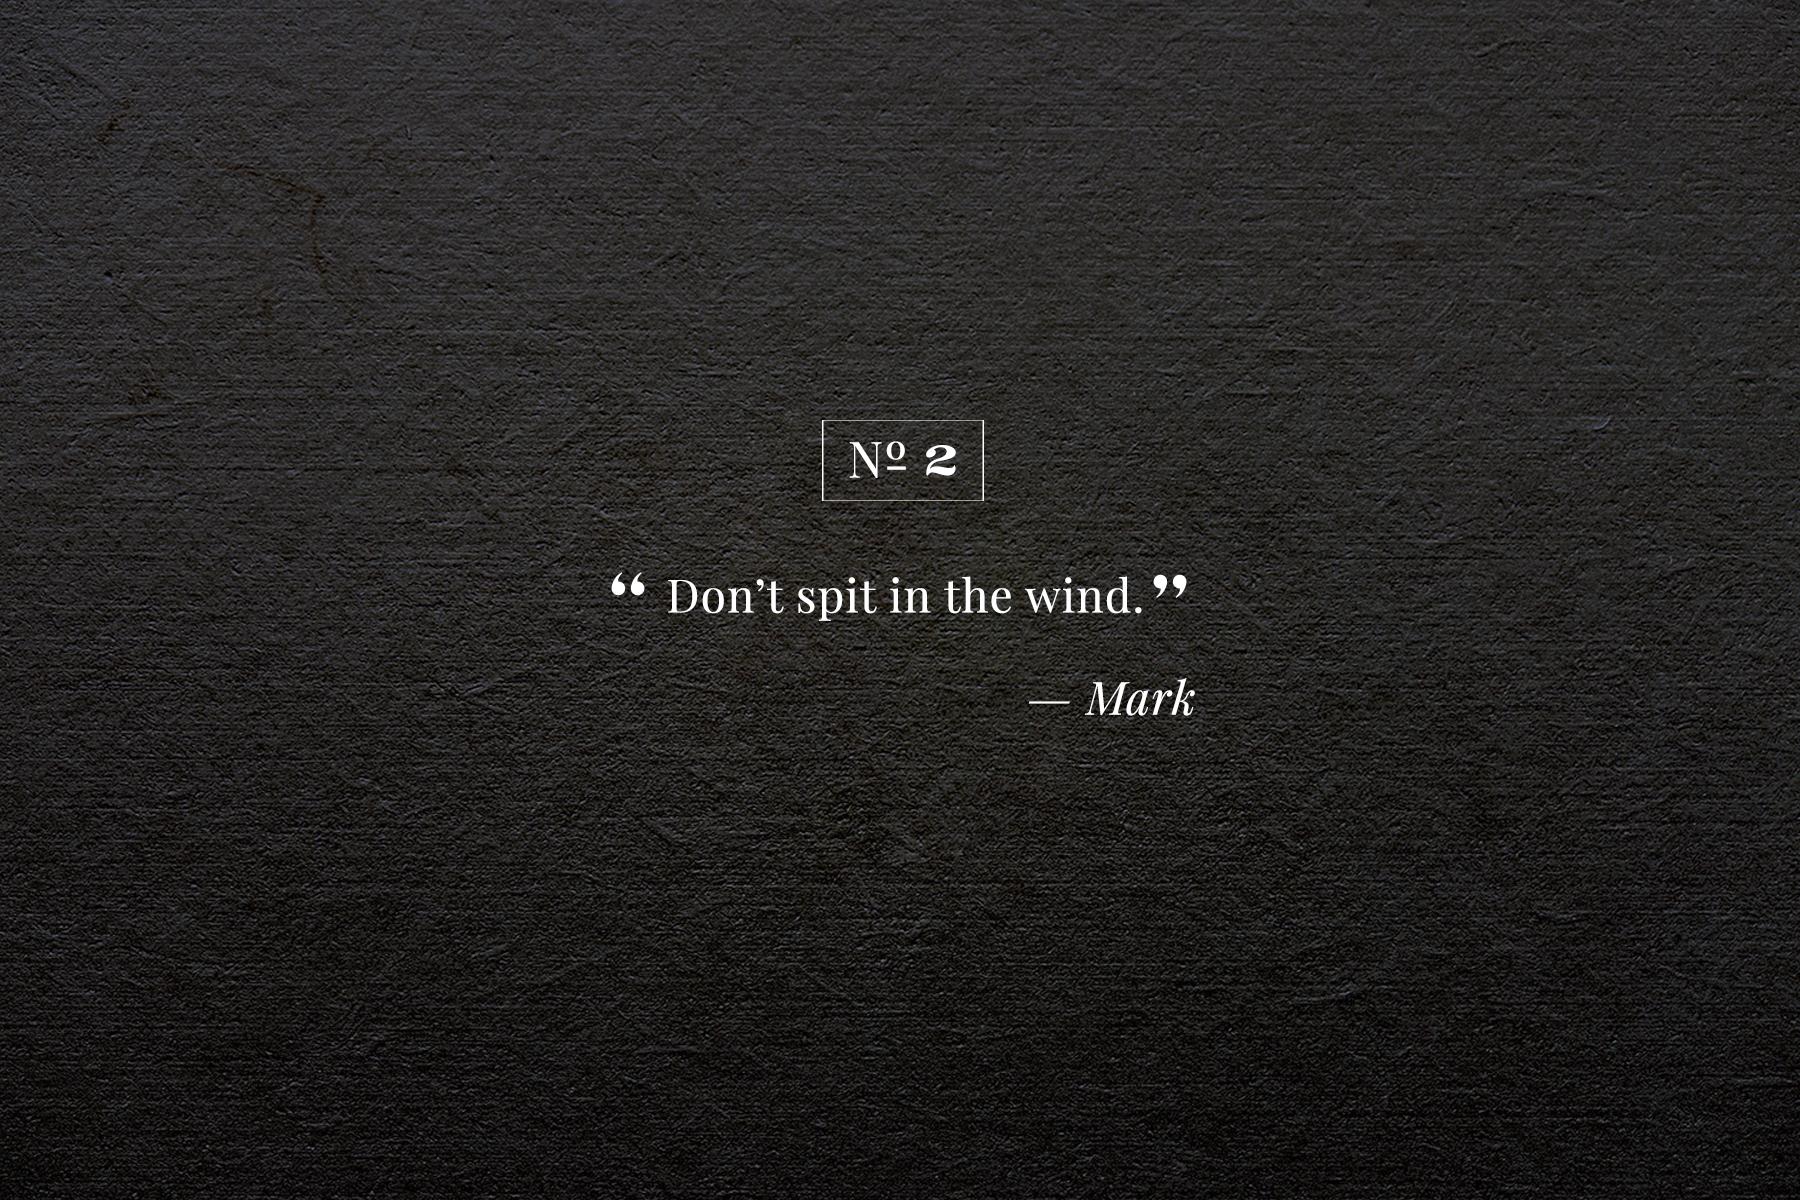 Mark #2.jpg